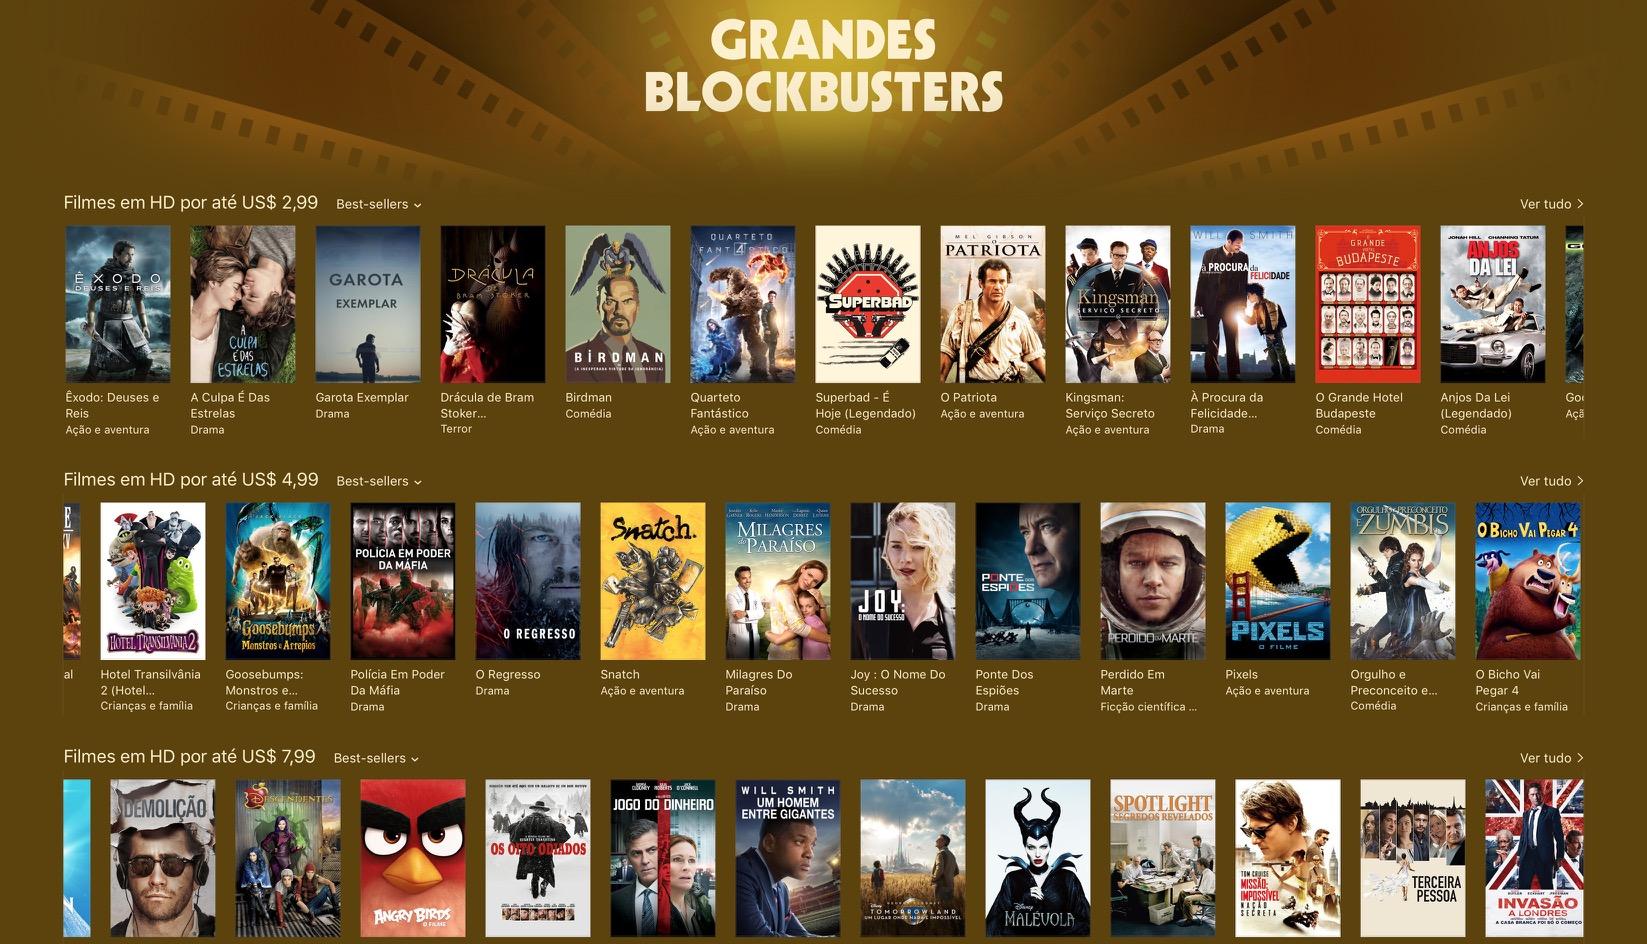 Grandes blockbusters - iTunes (Movie) Store